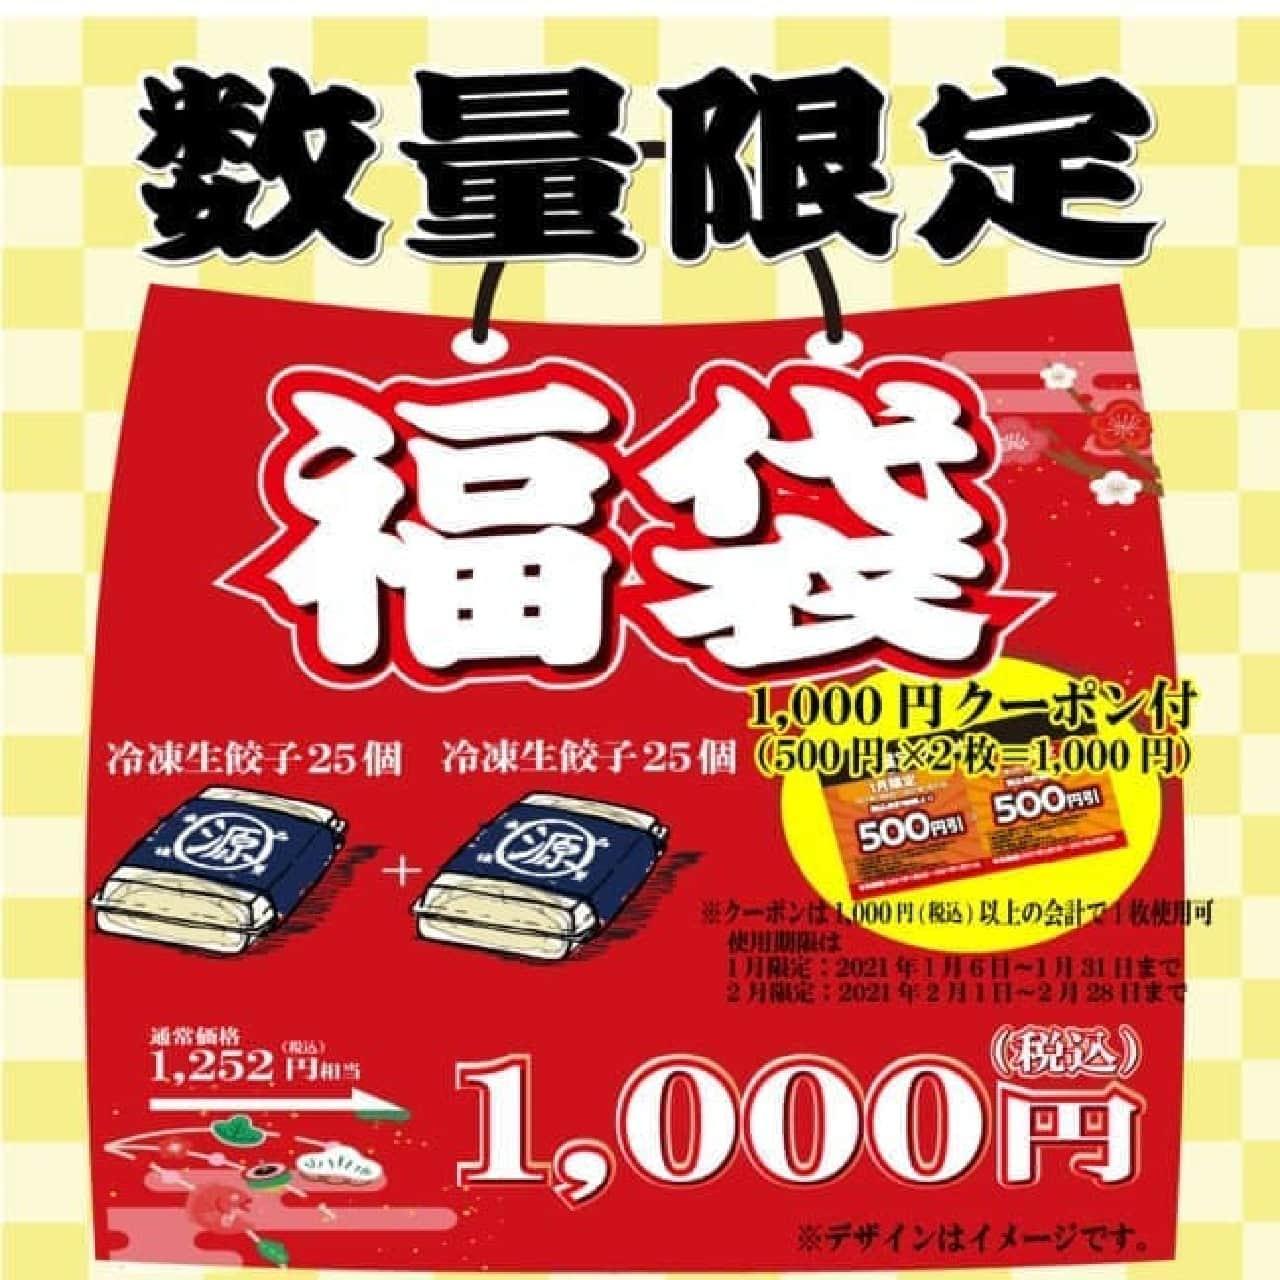 丸源ラーメン「丸源餃子福袋」